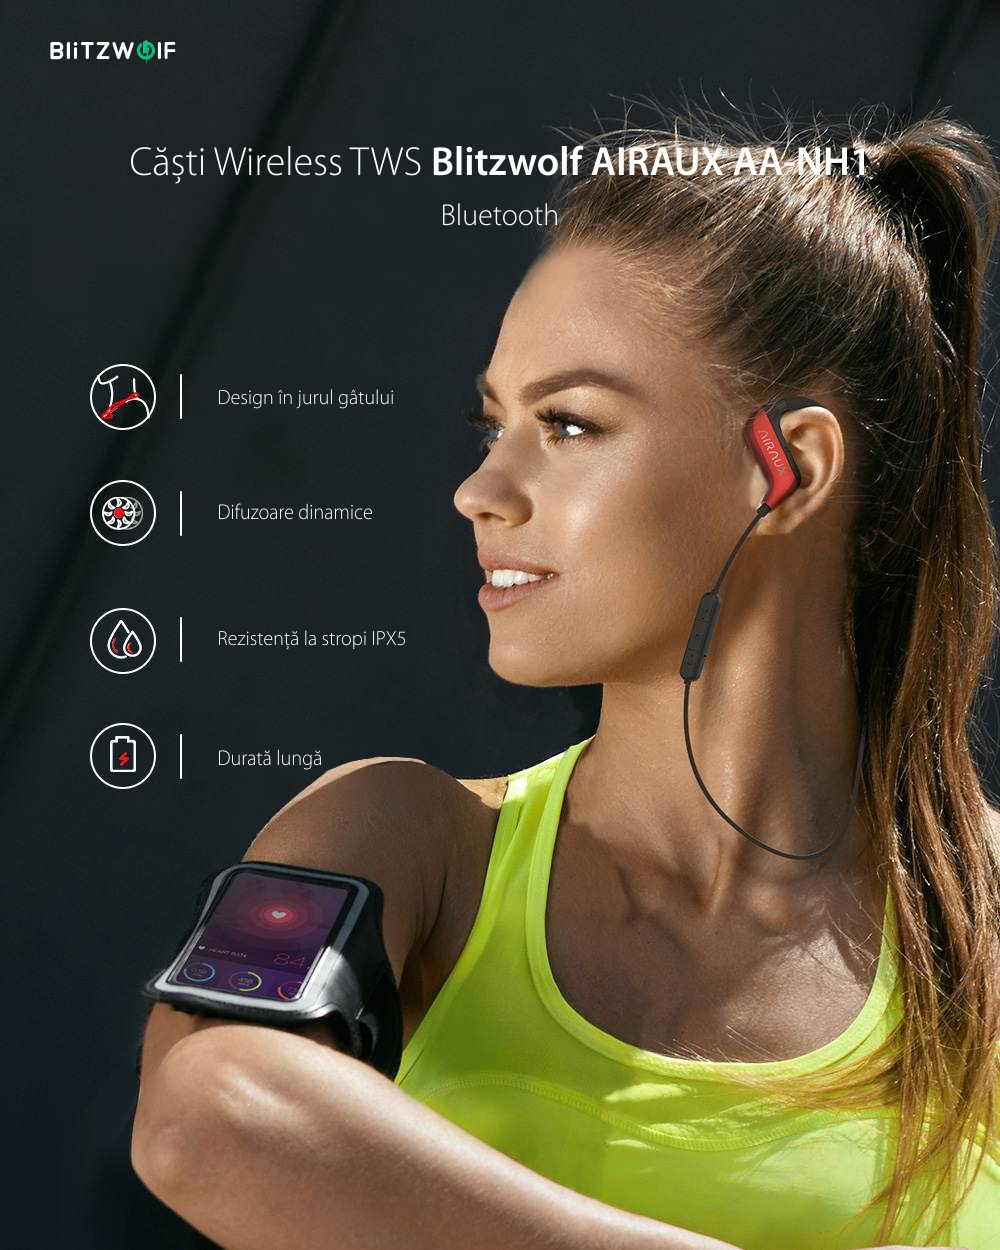 Casti BlitzWolf AIRAUX AA-NH1, Rosu si negru, Wireless, Bluetooth 5.0, Impedanta 16 ohm